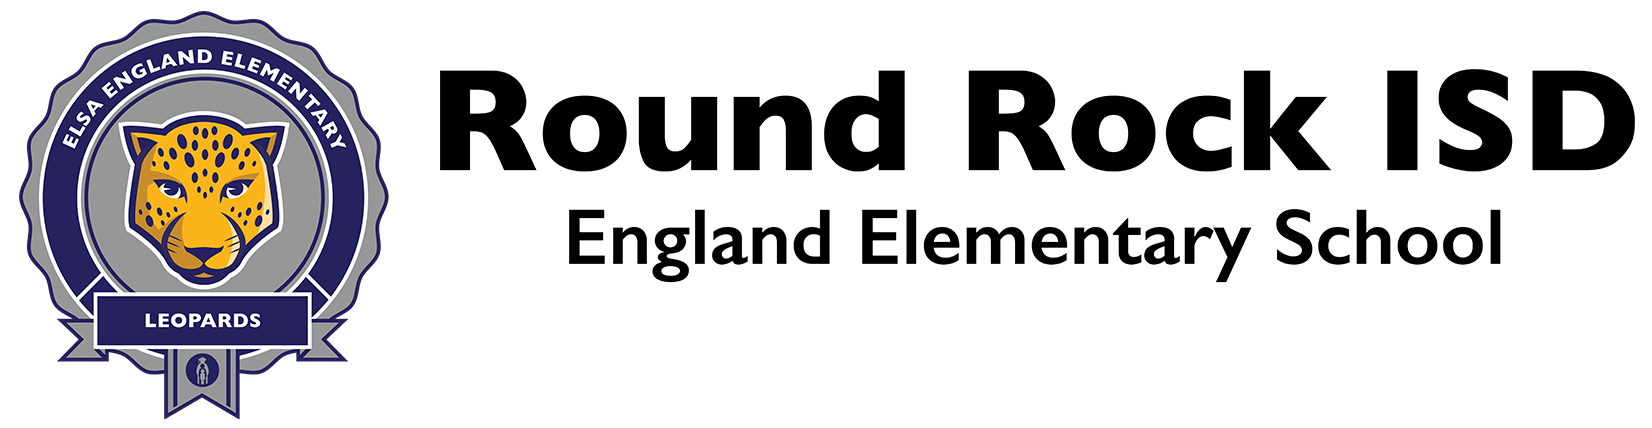 Elsa England Elementary School